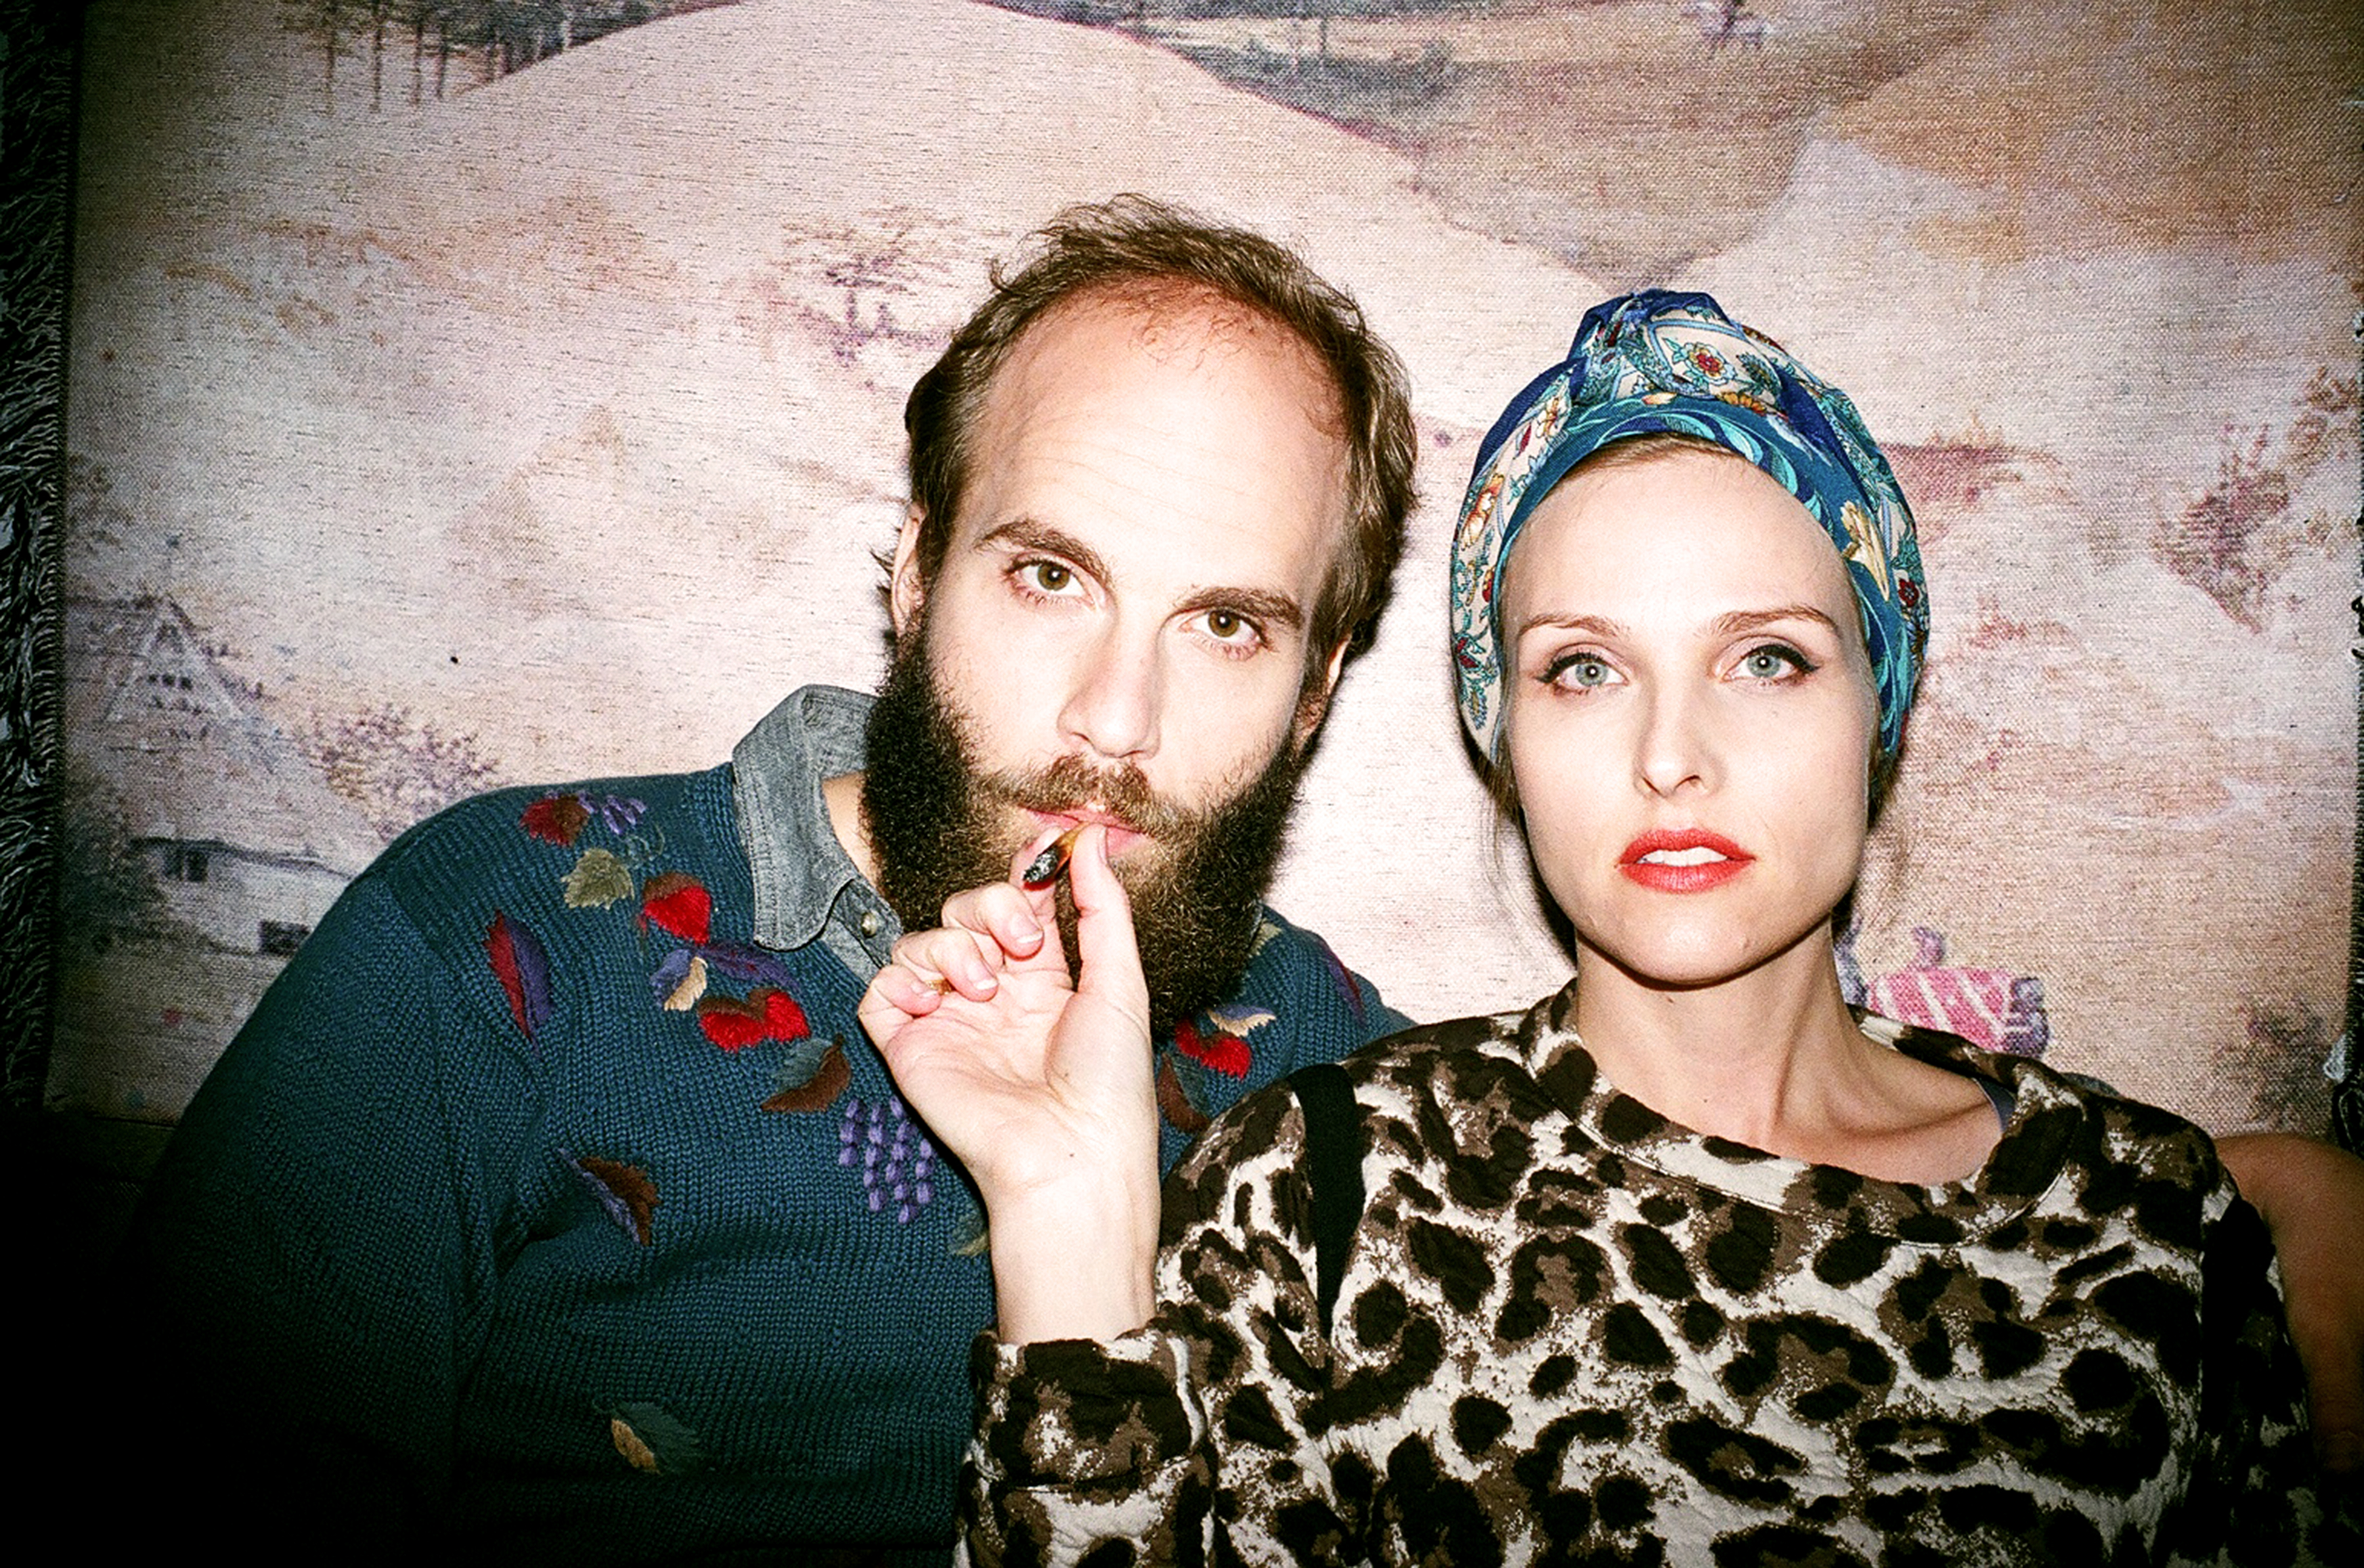 High Maintenance creators Ben Sinclair and Katja Blichfeld